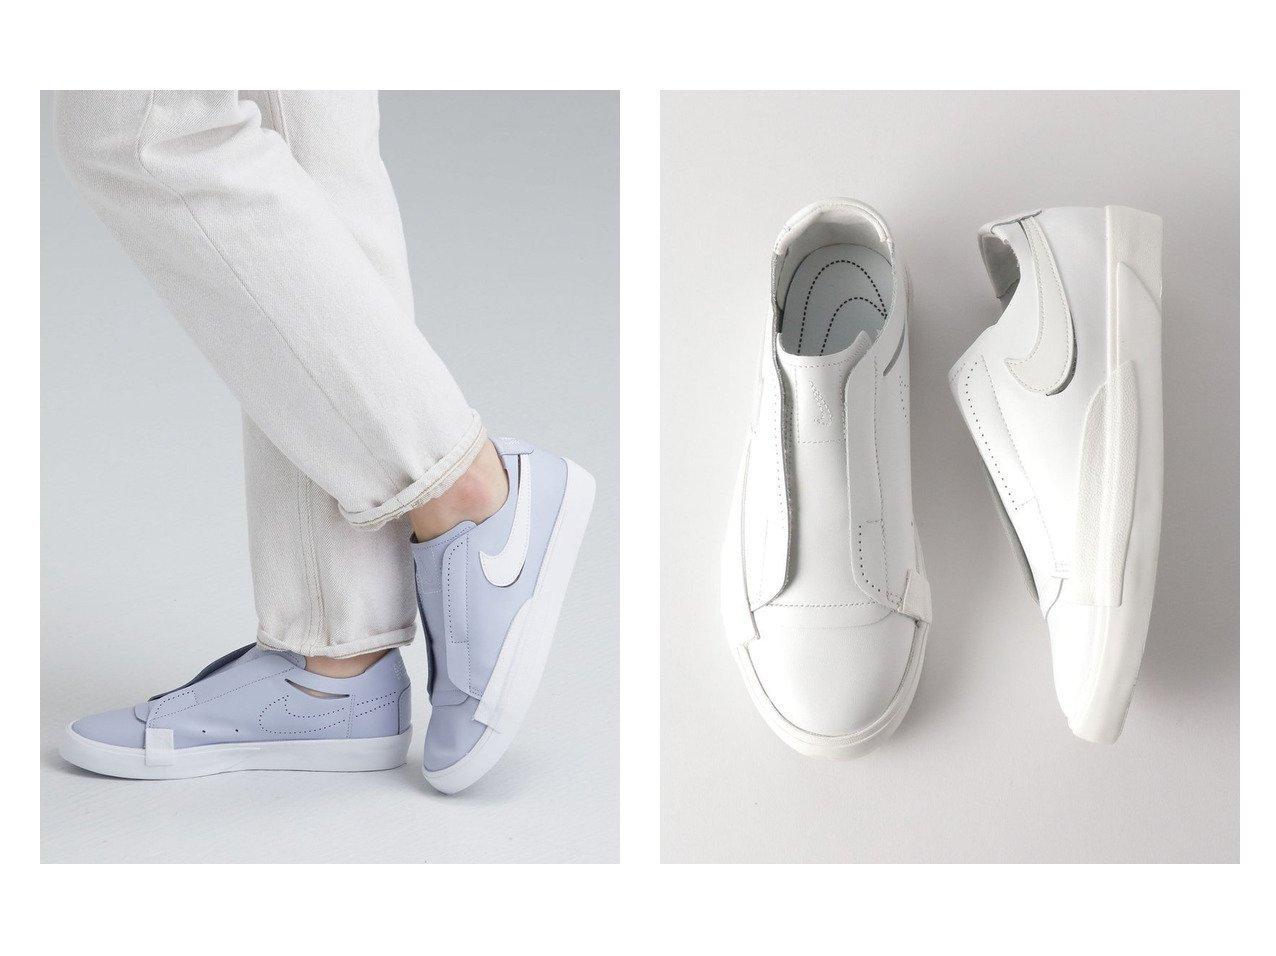 【green label relaxing / UNITED ARROWS/グリーンレーベル リラクシング / ユナイテッドアローズ】の[ ナイキ ]NIKE SC ブレーザー スリッポン スニーカー シューズ・靴のおすすめ!人気、トレンド・レディースファッションの通販 おすすめで人気の流行・トレンド、ファッションの通販商品 メンズファッション・キッズファッション・インテリア・家具・レディースファッション・服の通販 founy(ファニー) https://founy.com/ ファッション Fashion レディースファッション WOMEN インソール クッション シューズ シンプル スニーカー スリッポン 楽ちん |ID:crp329100000009792